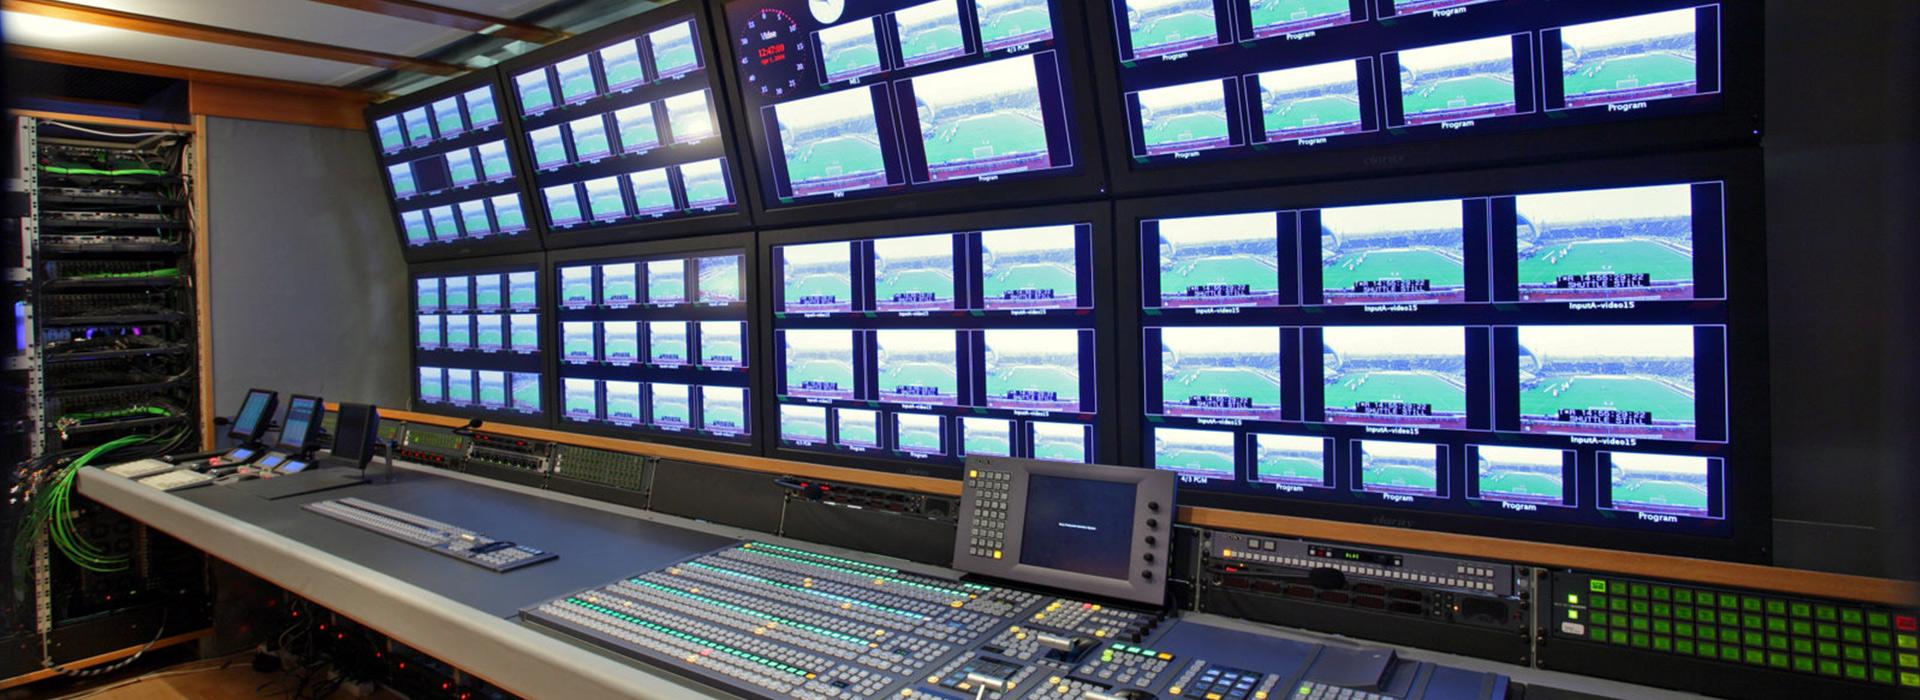 Regie mobili per riprese televisive esterne